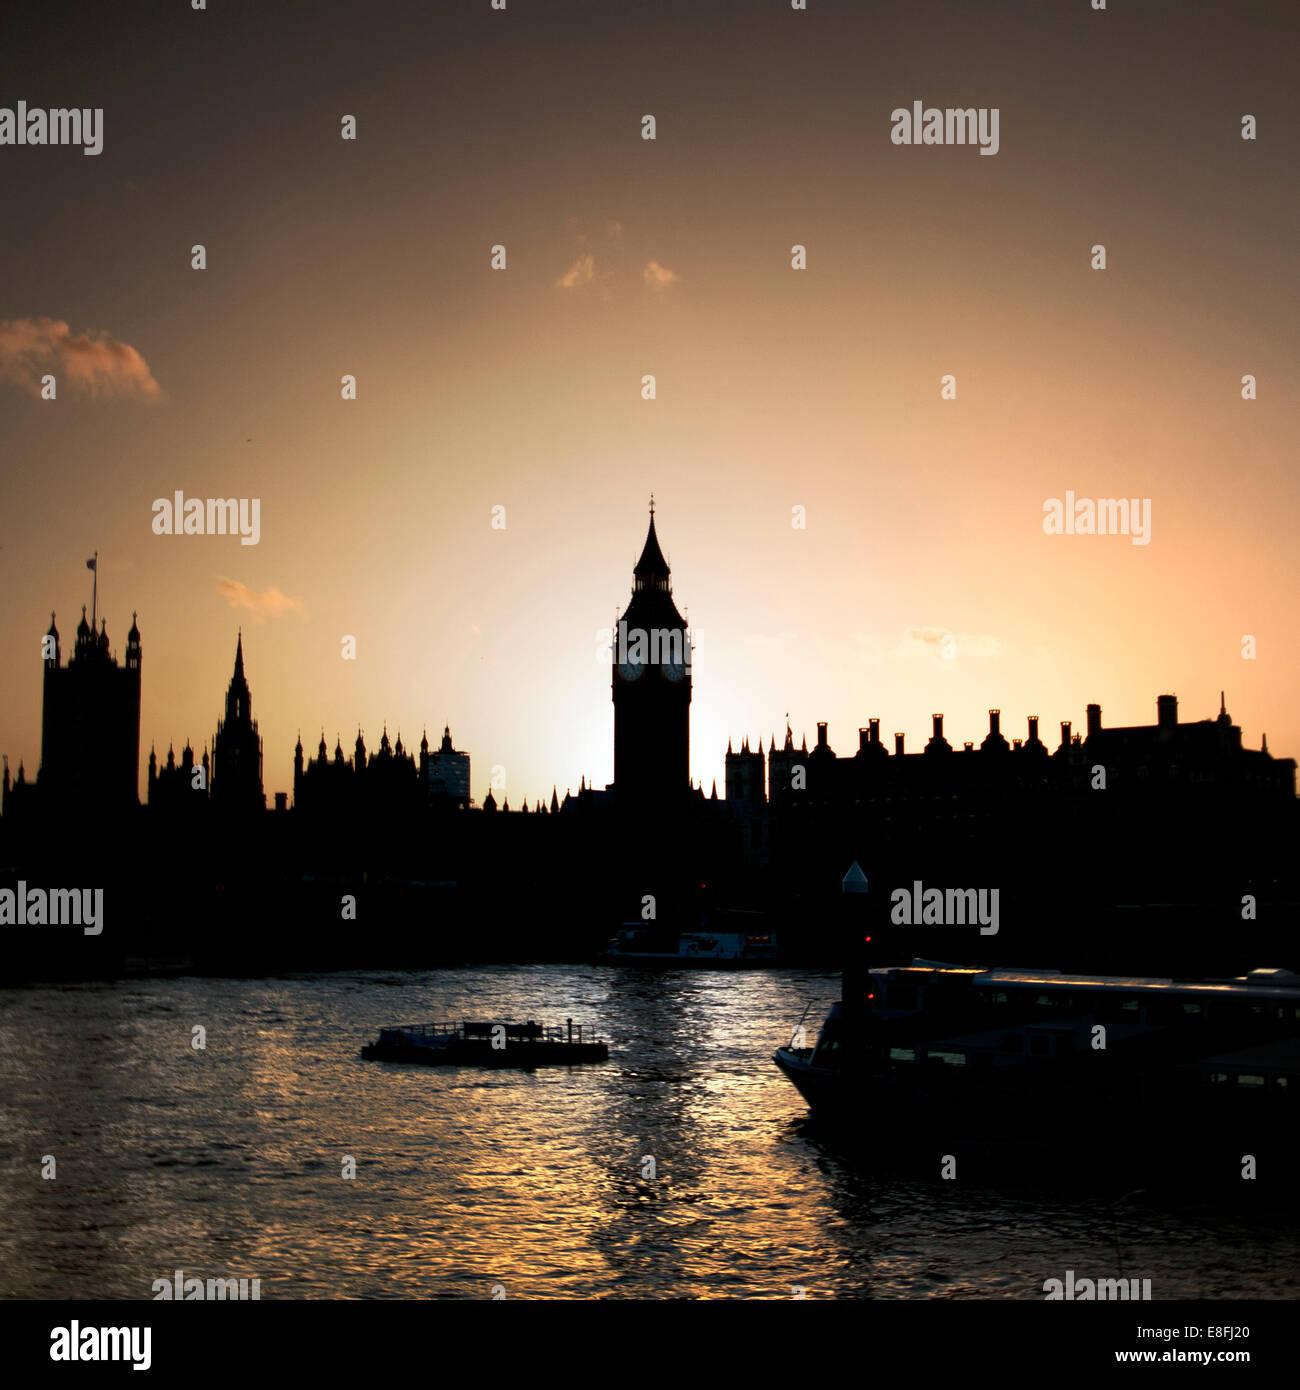 Houses of Parliament and Big Ben at sunset, London, England, UK - Stock Image